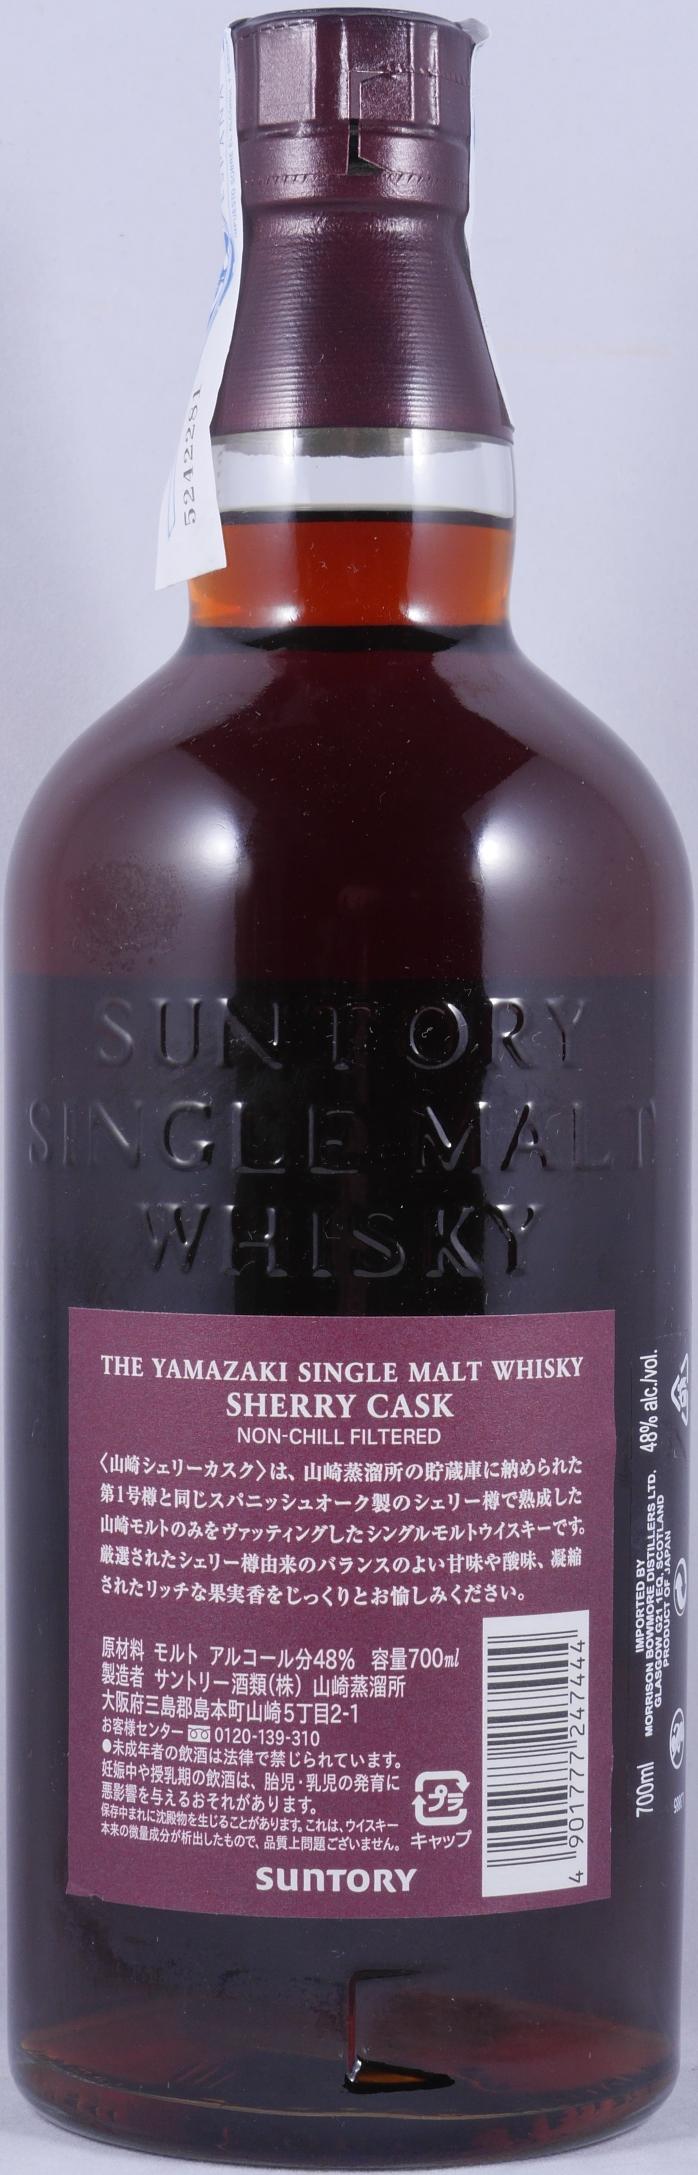 Yamazaki single malt sherry cask 2013 schweiz